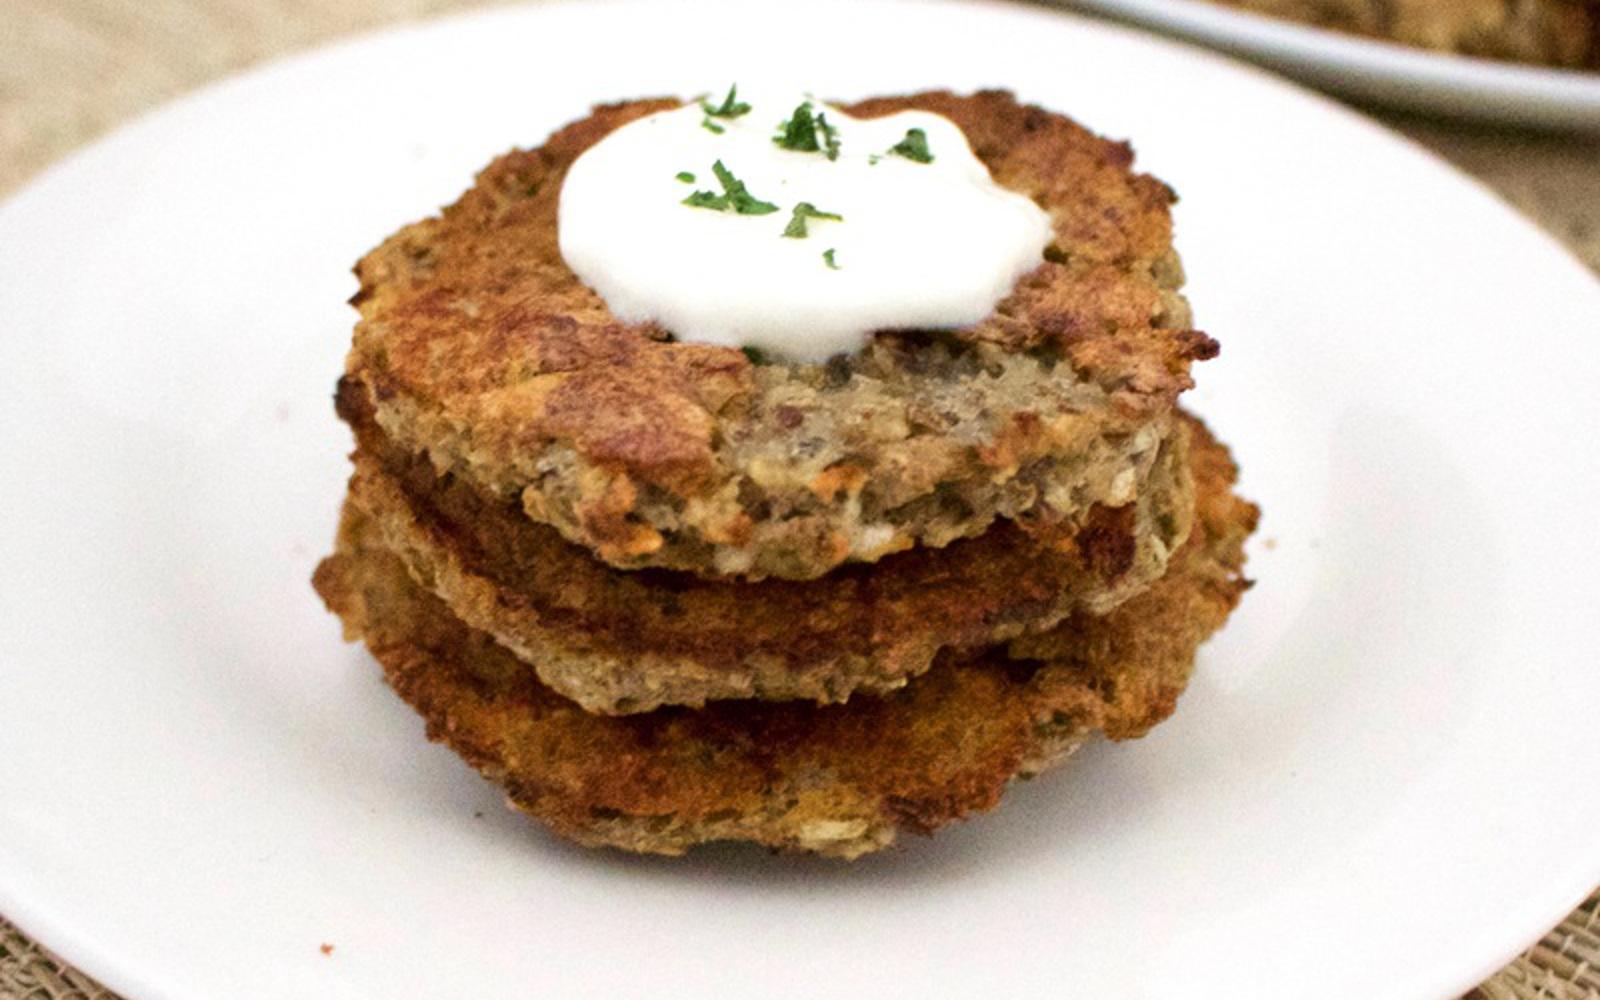 Vegan Gluten-Free Oven-Baked Latkes